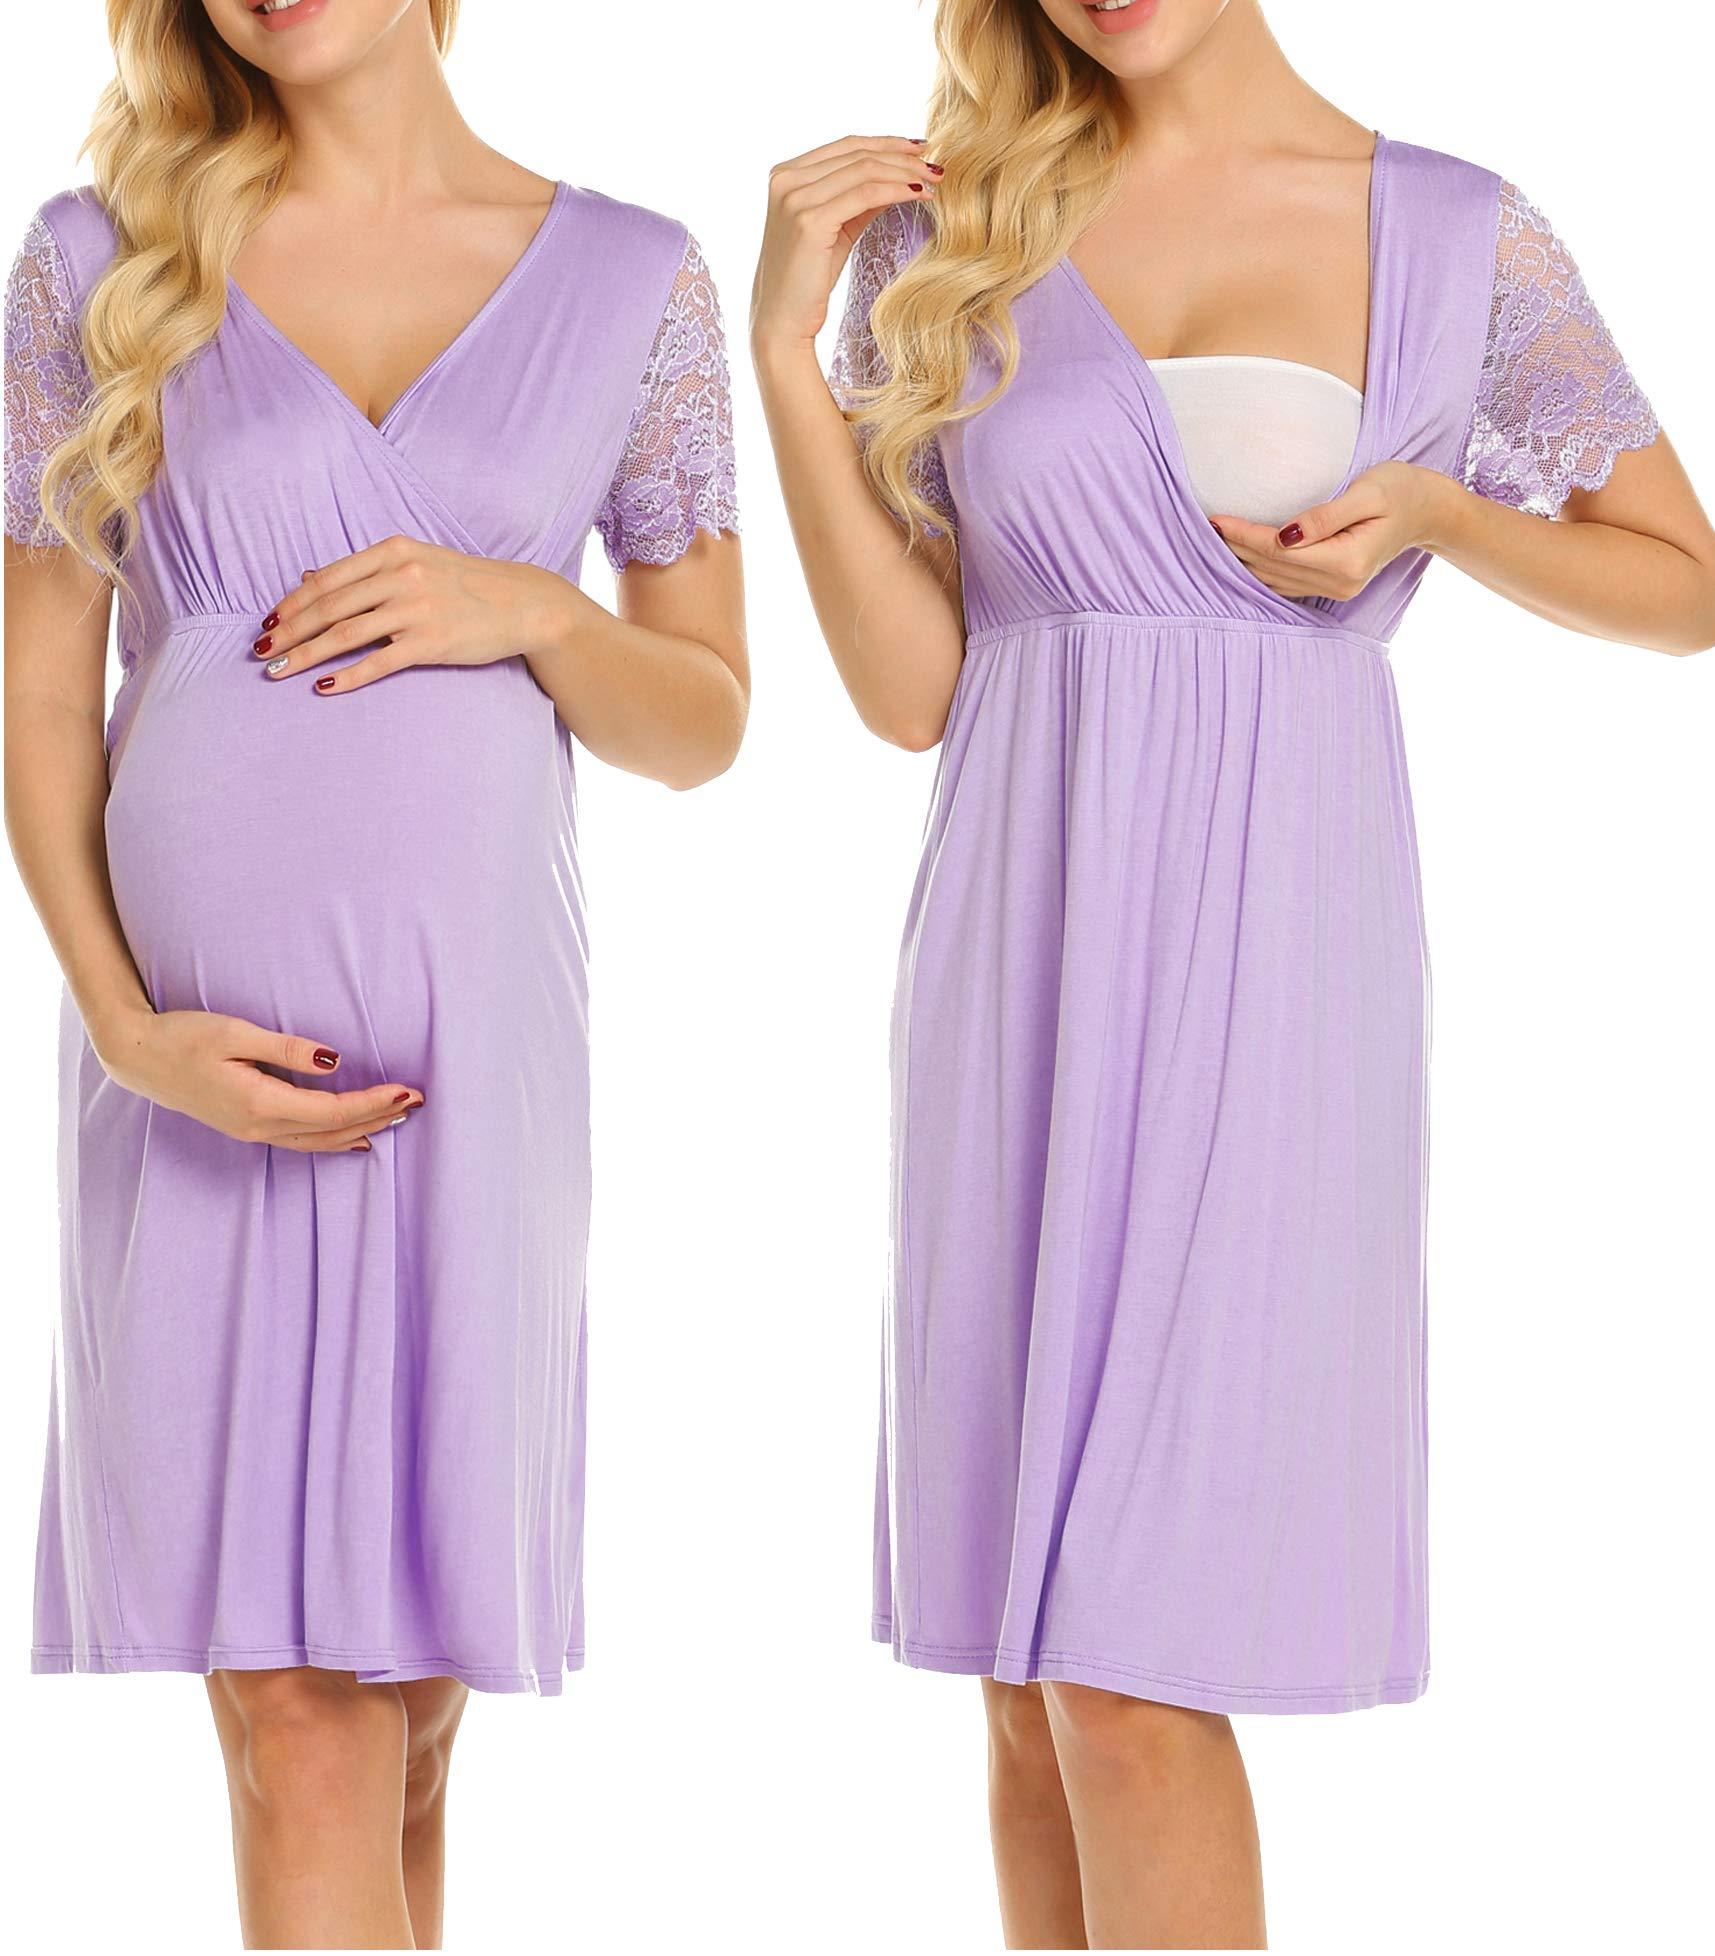 MAXMODA Women's Short Sleeve Maternity Dress Nursing Breastfeeding Nightgown Dress by MAXMODA